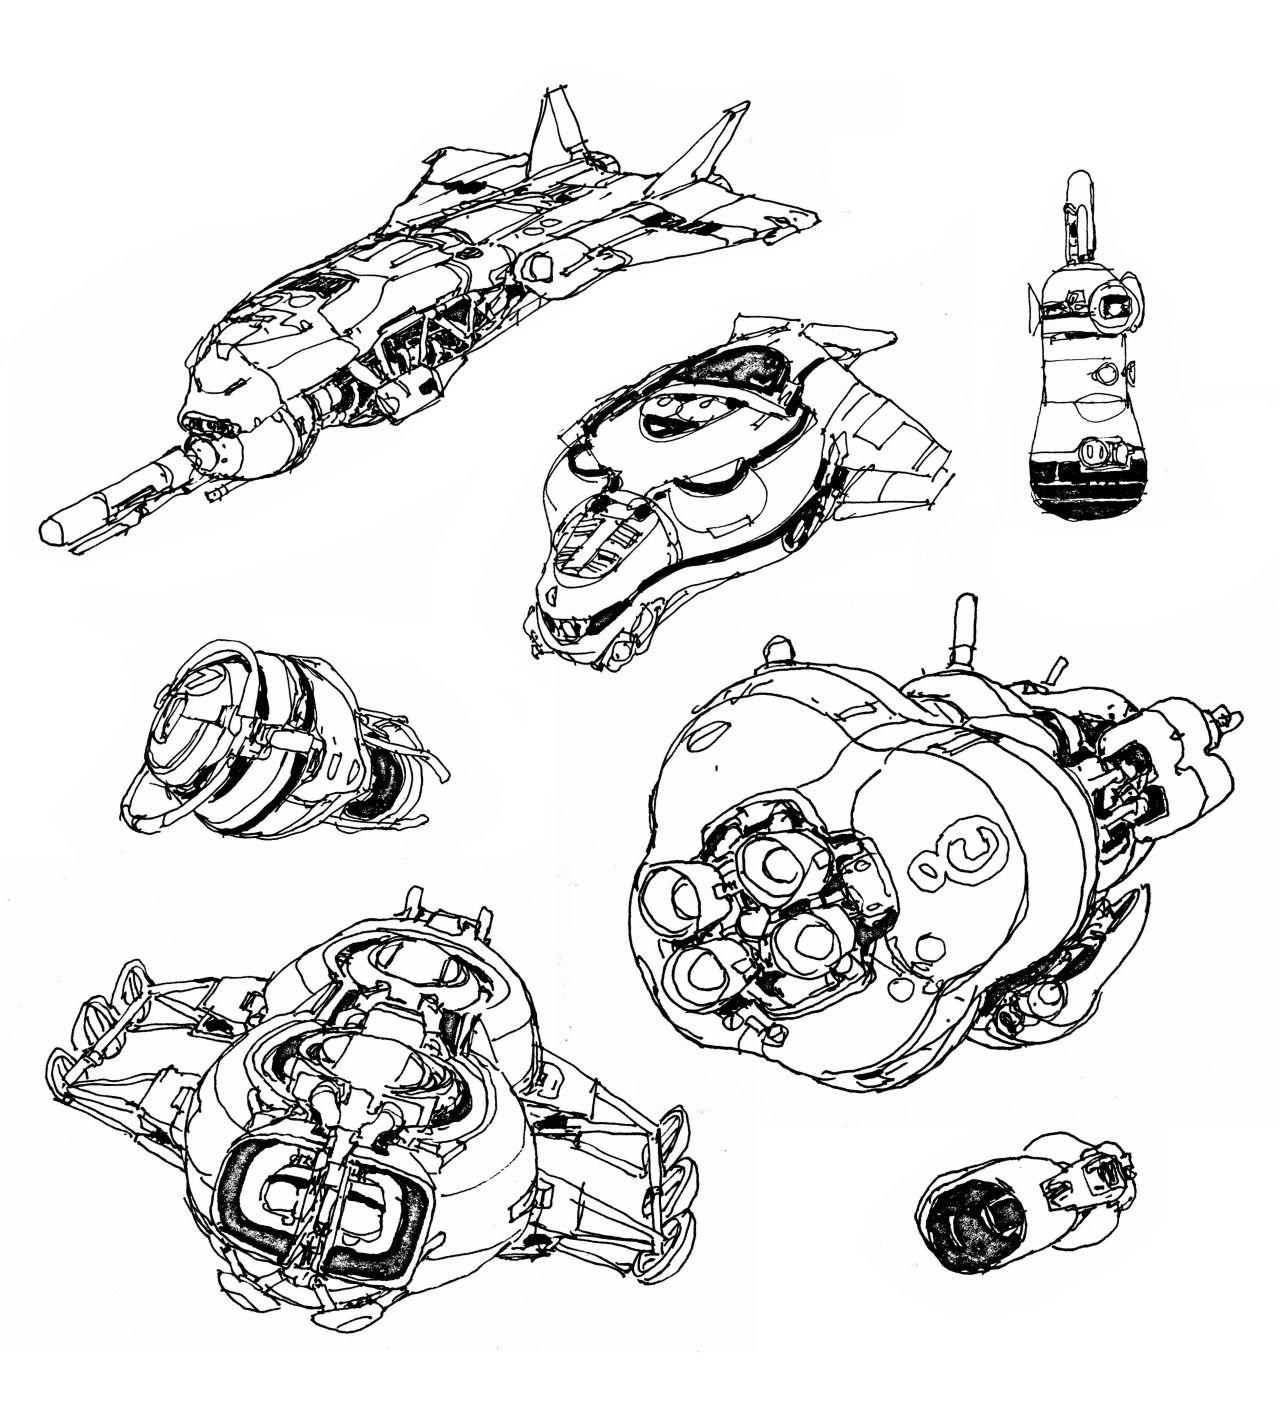 Sci Fi Spaceships